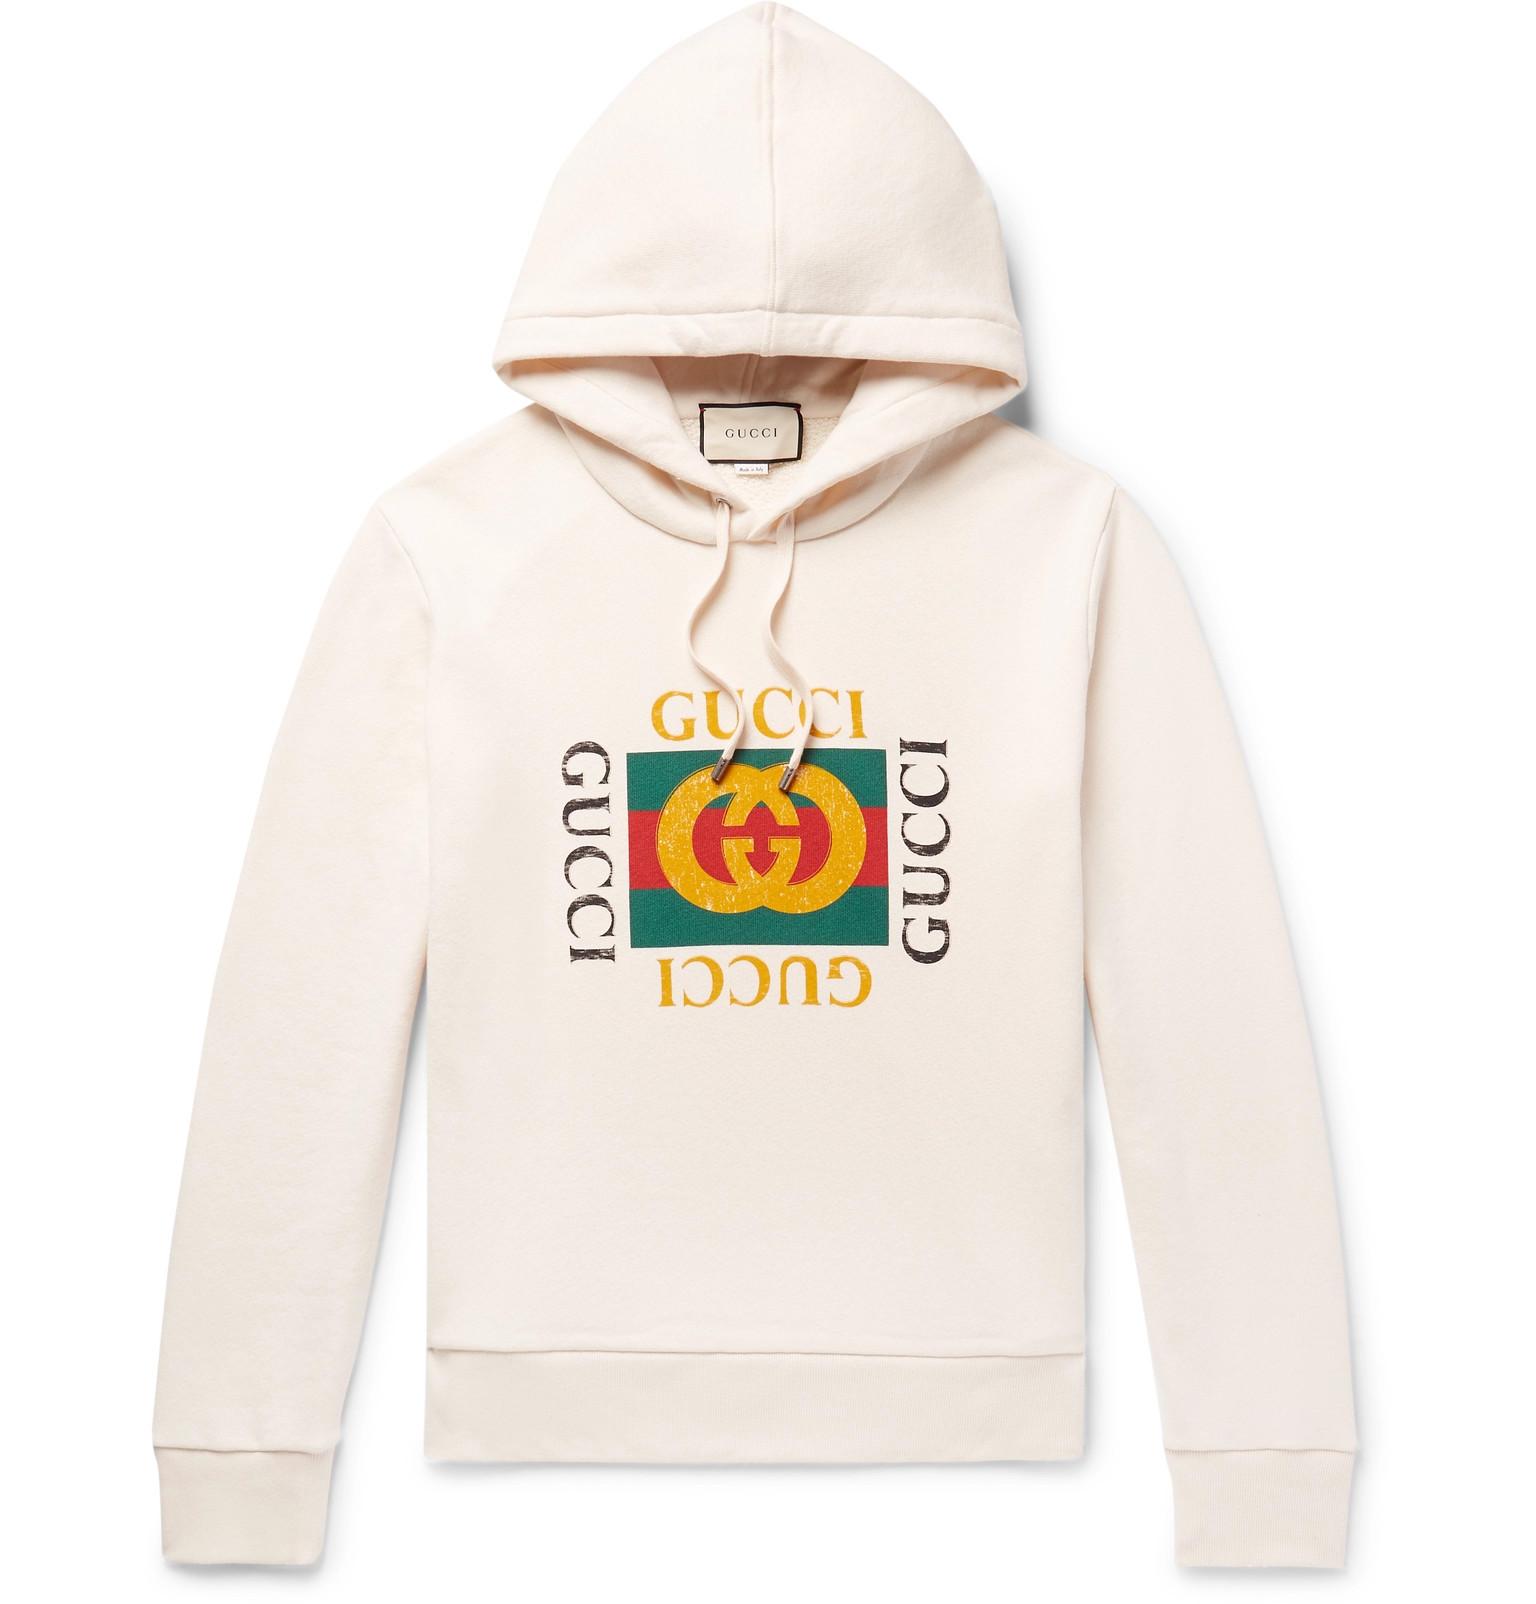 d3b86b3dc65 Gucci - Printed Loopback Cotton-Jersey Hoodie